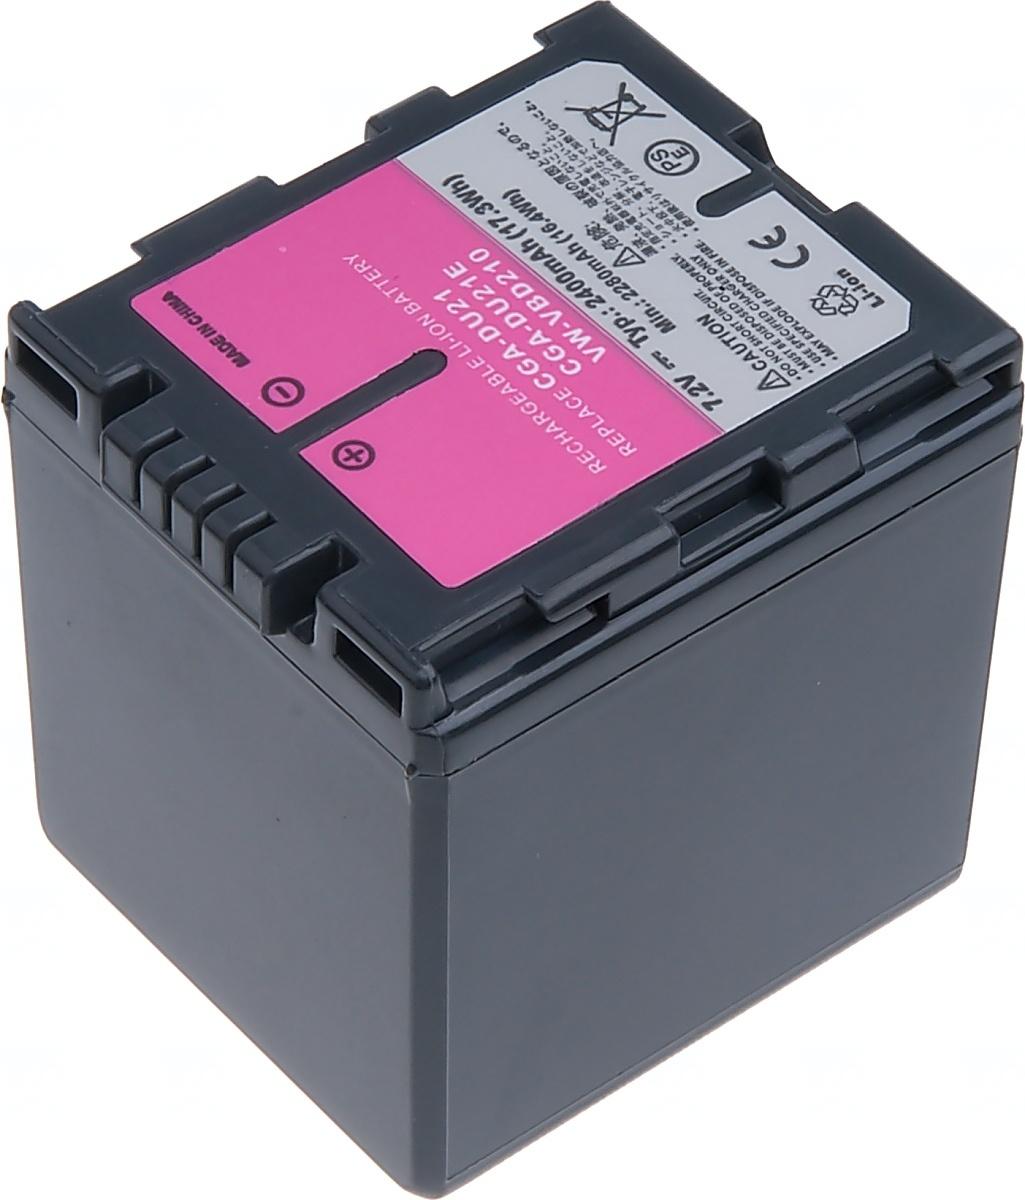 Baterie T6 power Panasonic VW-VBD210, CGA-DU21, Hitachi DZ-BP14SW, 2400mAh, šedá